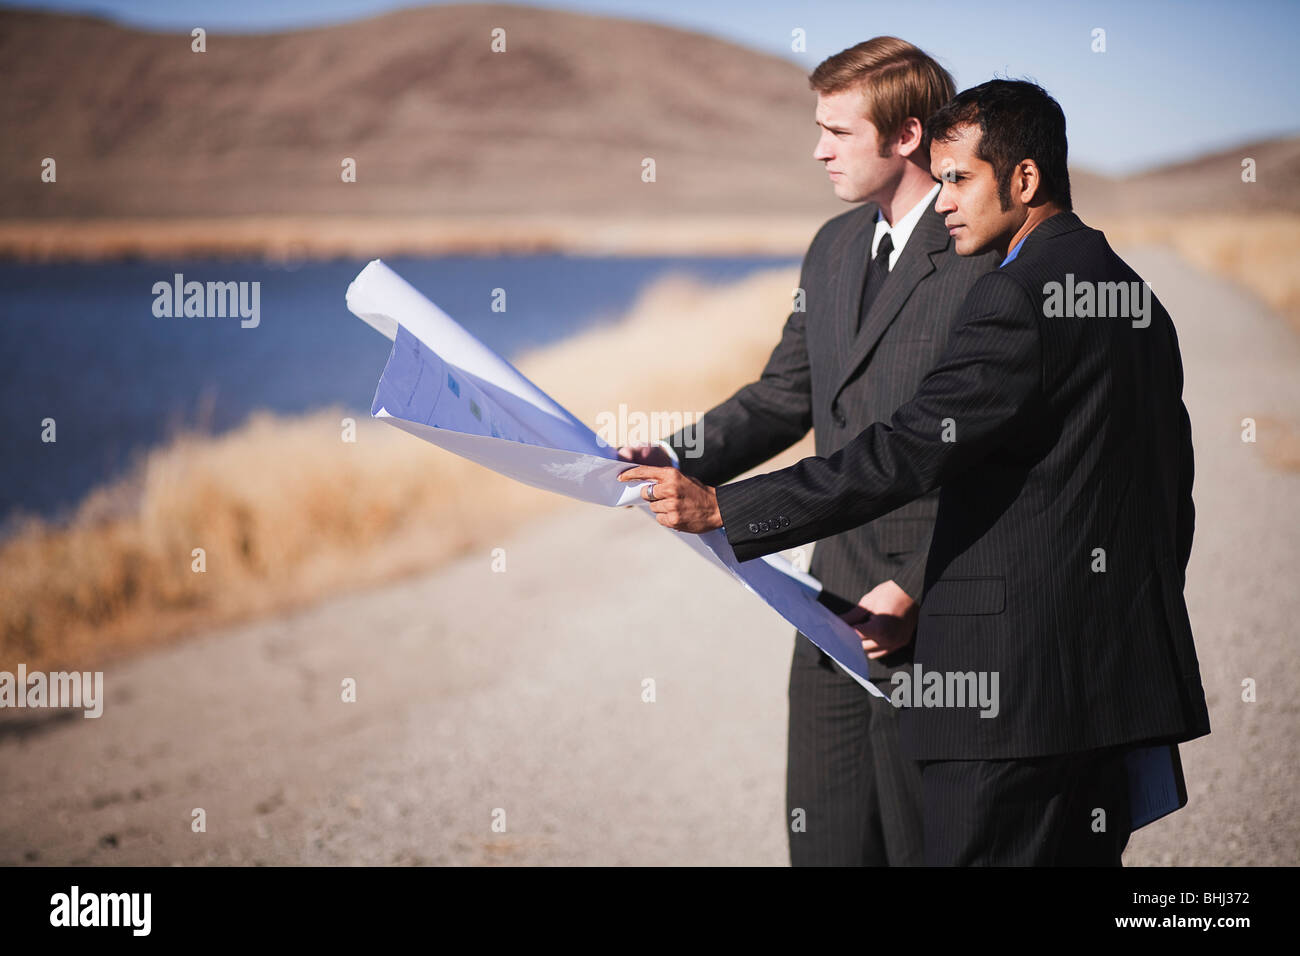 2 men with blueprints looking over water - Stock Image